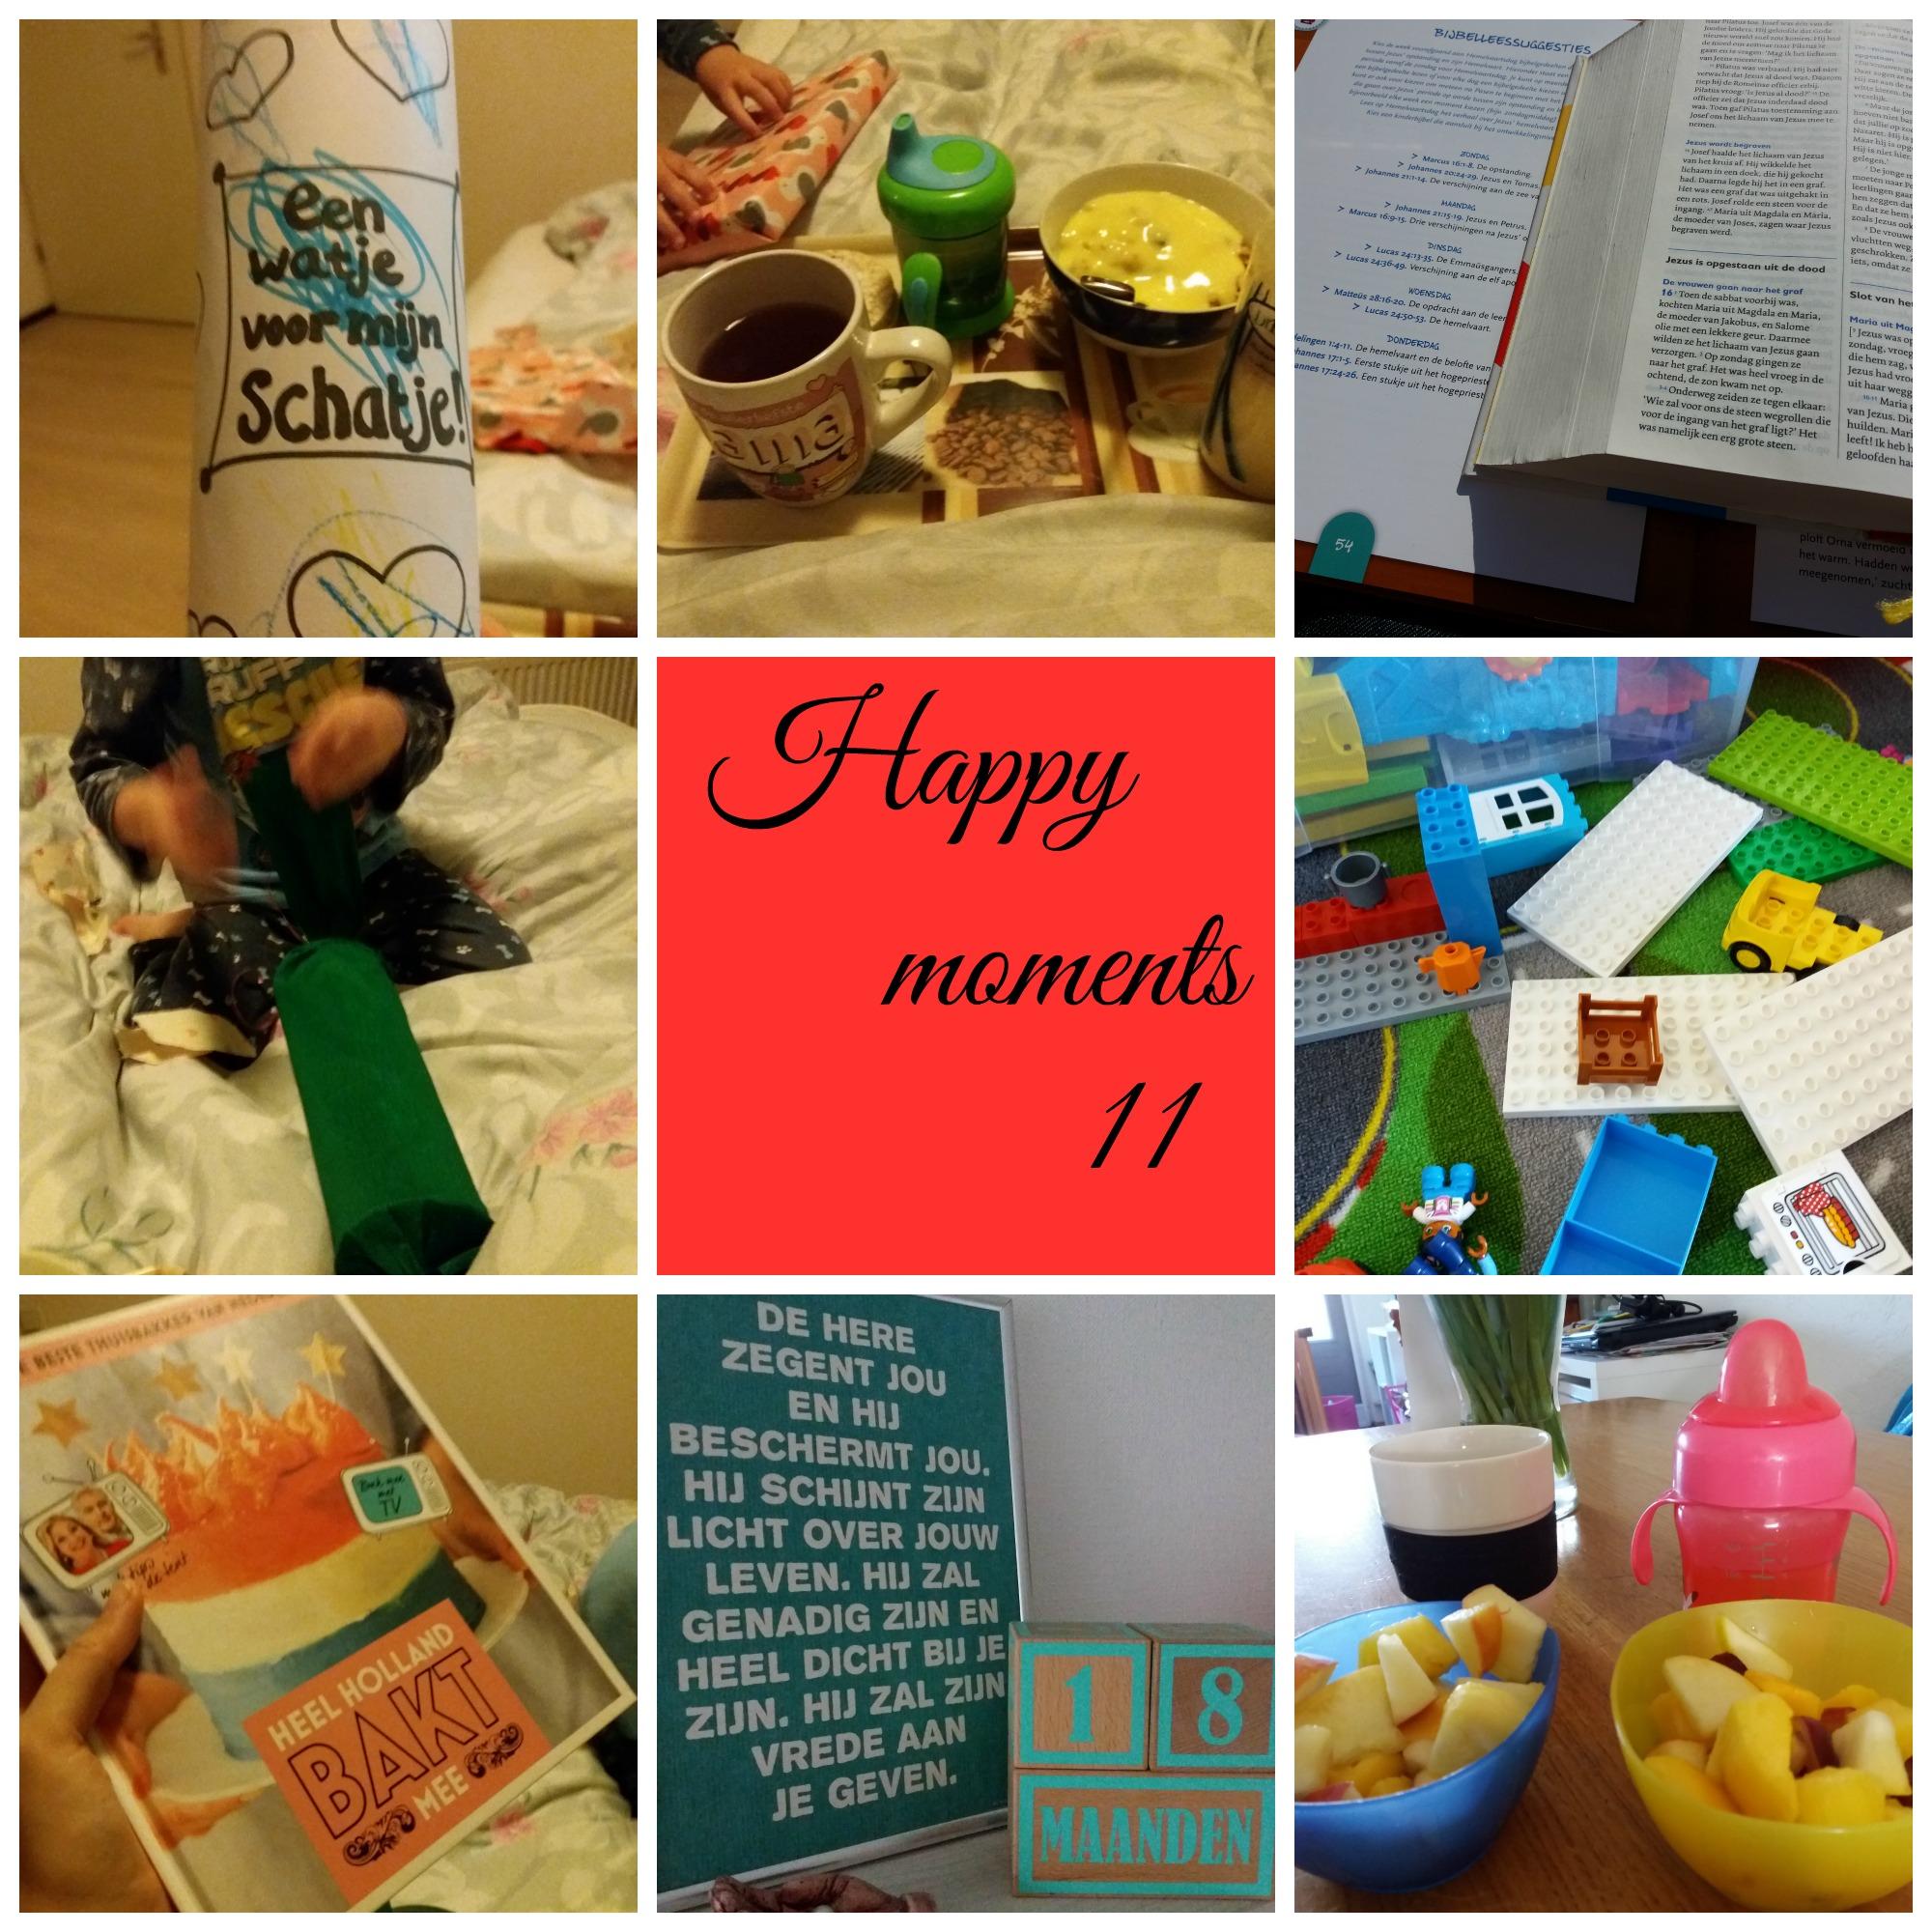 Happy moments #11